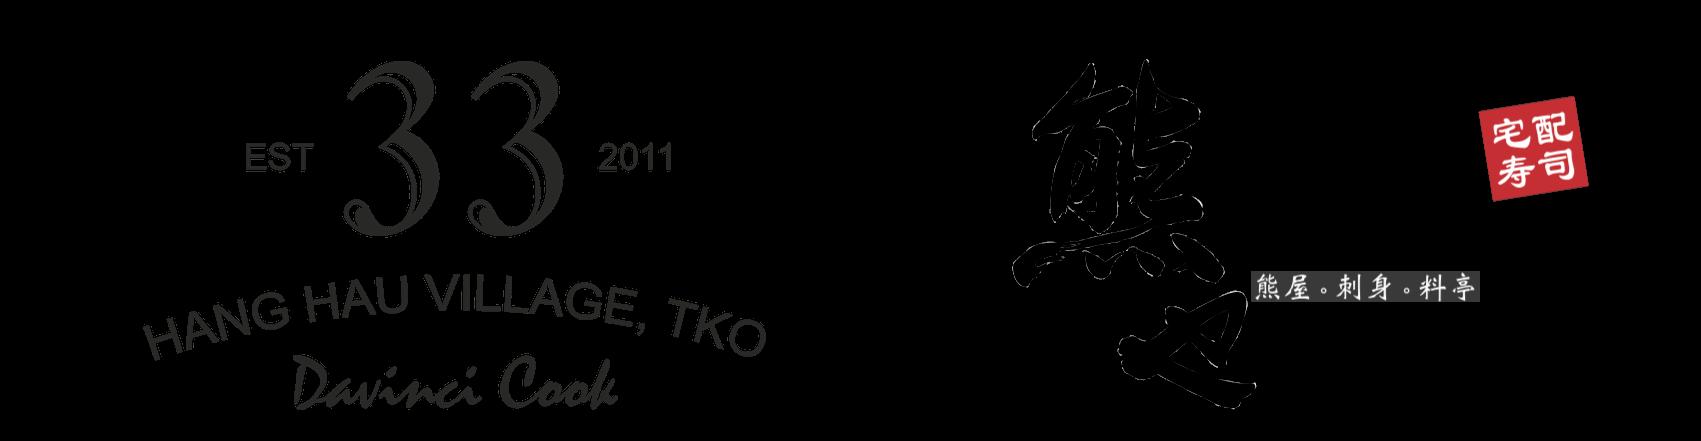 TKO Davinci Cook x 熊也 - tko.orderfood.hk